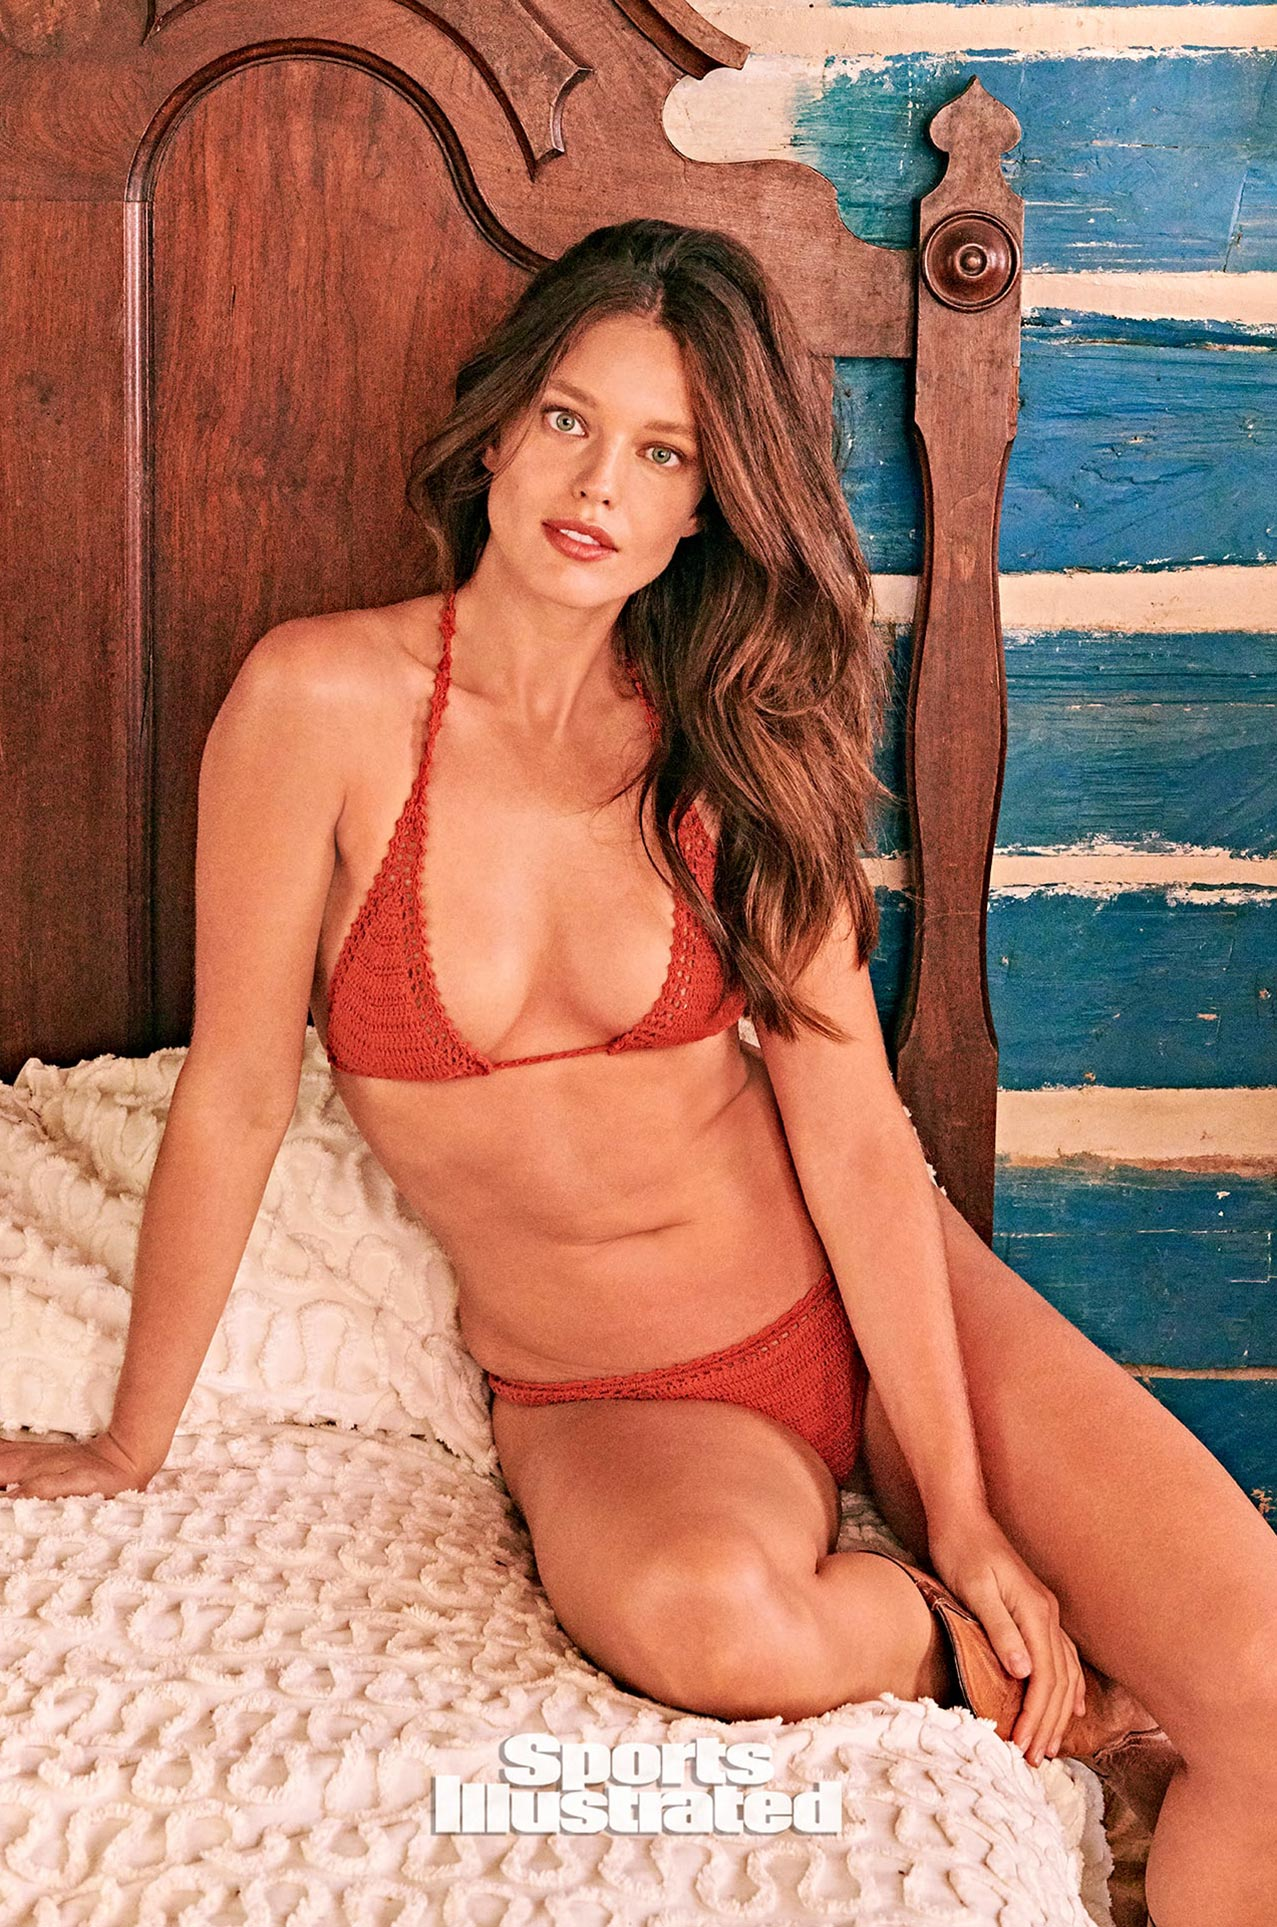 Эмили ДиДонато в каталоге купальников Sports Illustrated Swimsuit 2020 / фото 15